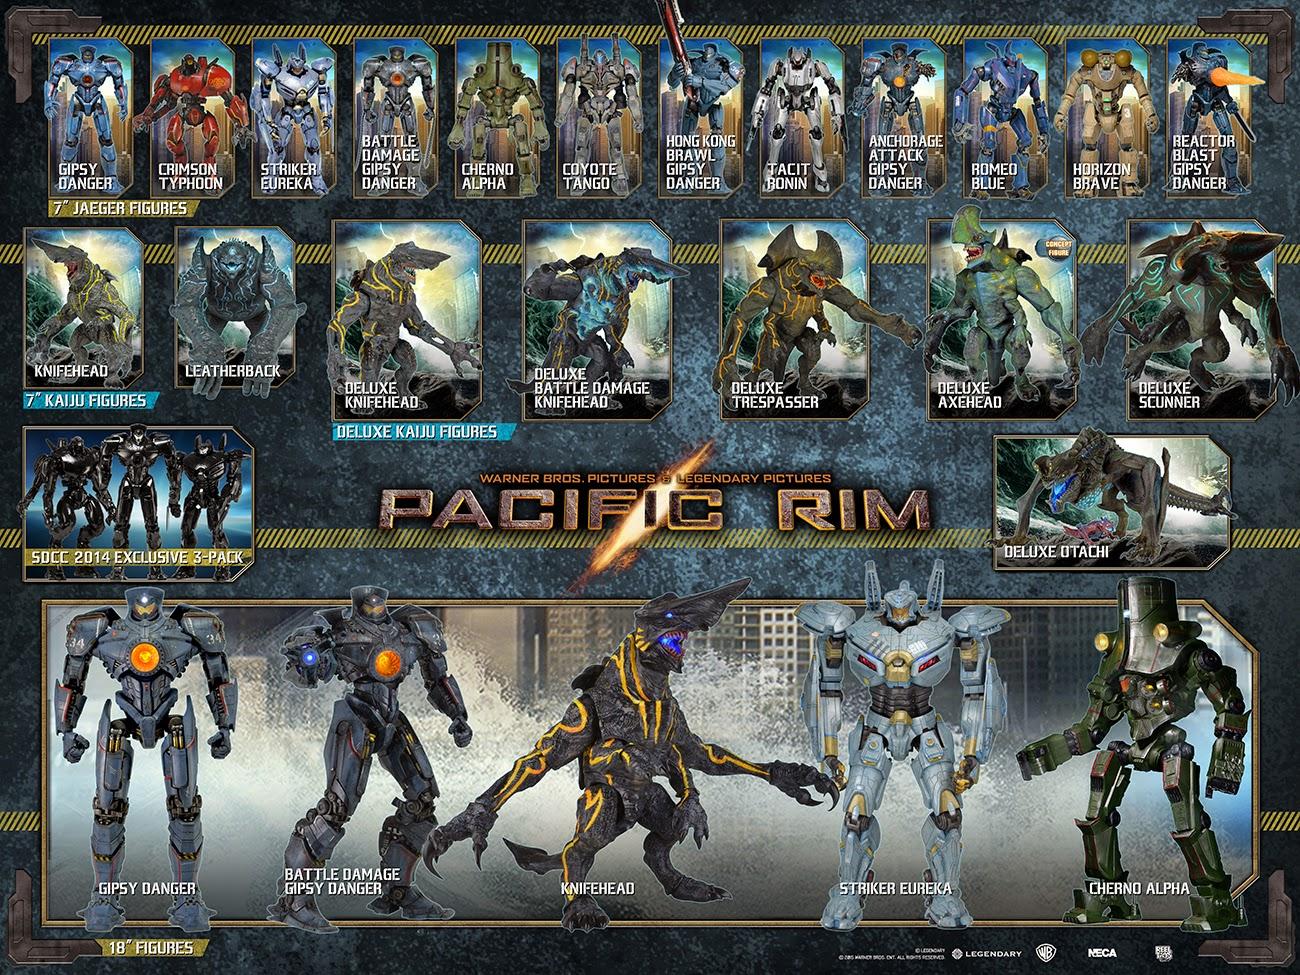 [NECA][Tópico Oficial] Pacific Rim: Jaegers Series 6 - Página 5 Jpeg-1300w-PacRim_VisualGuide_2015